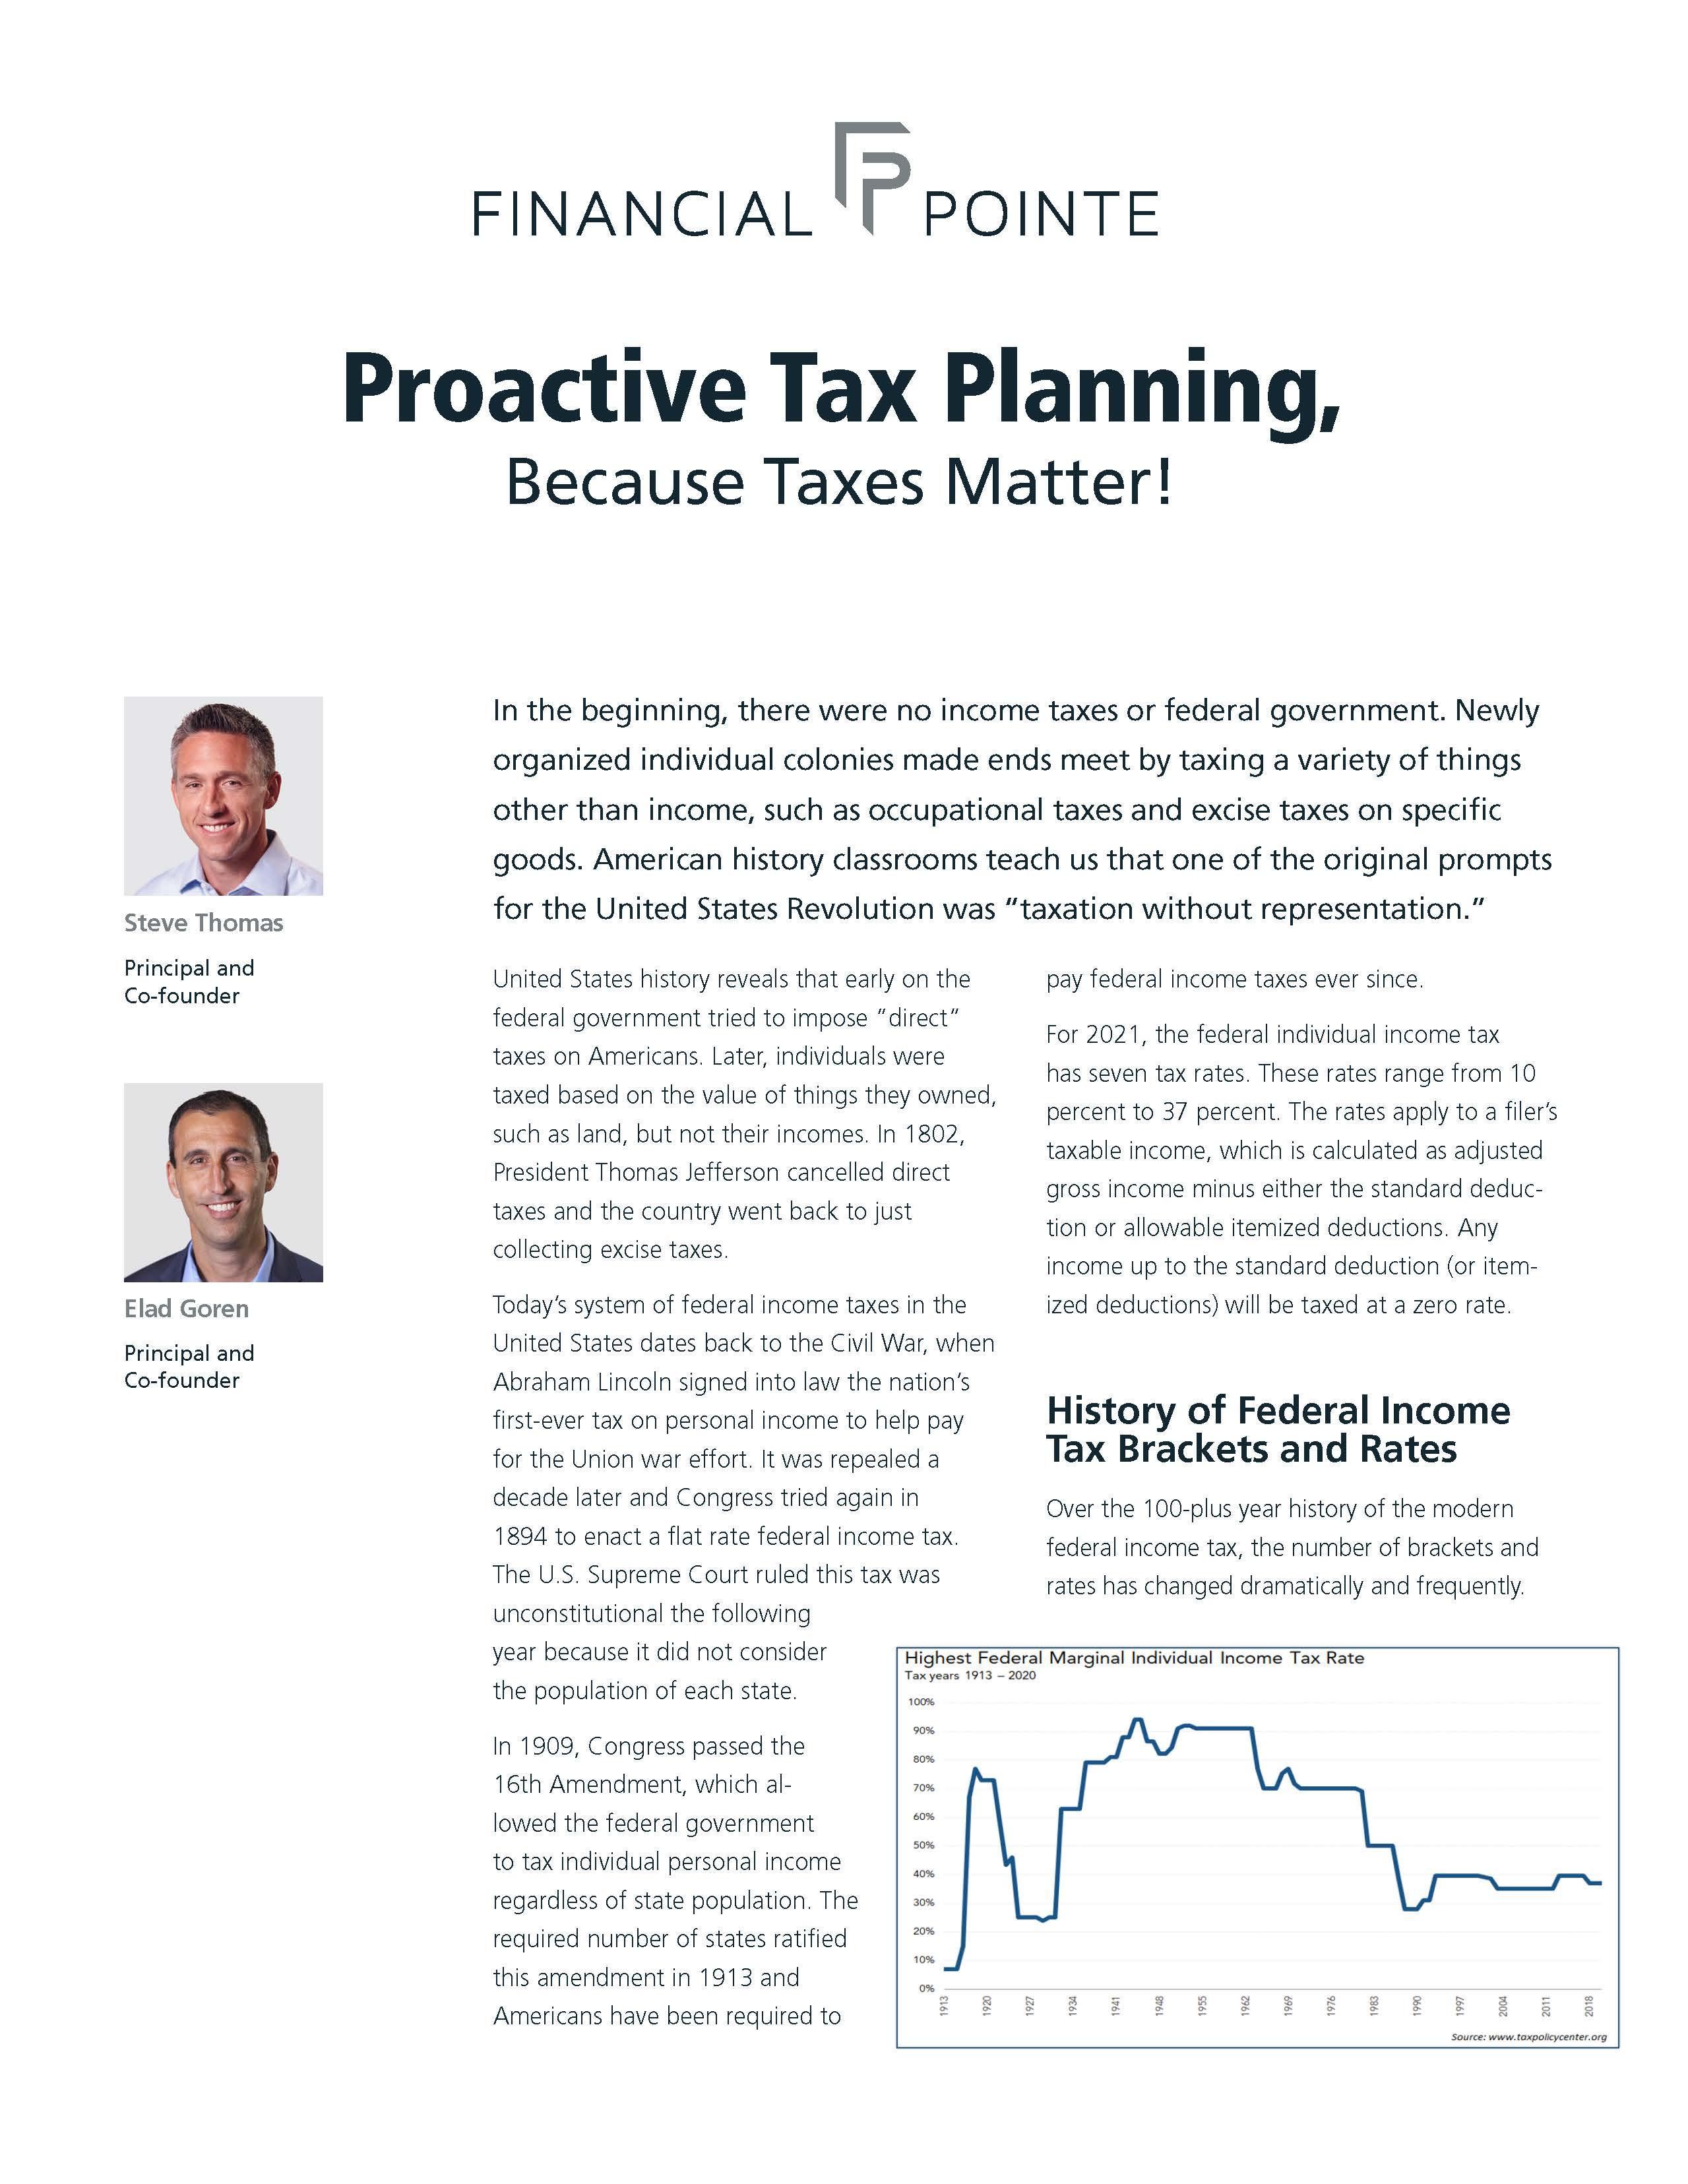 Proactive Tax Planning Thumbnail